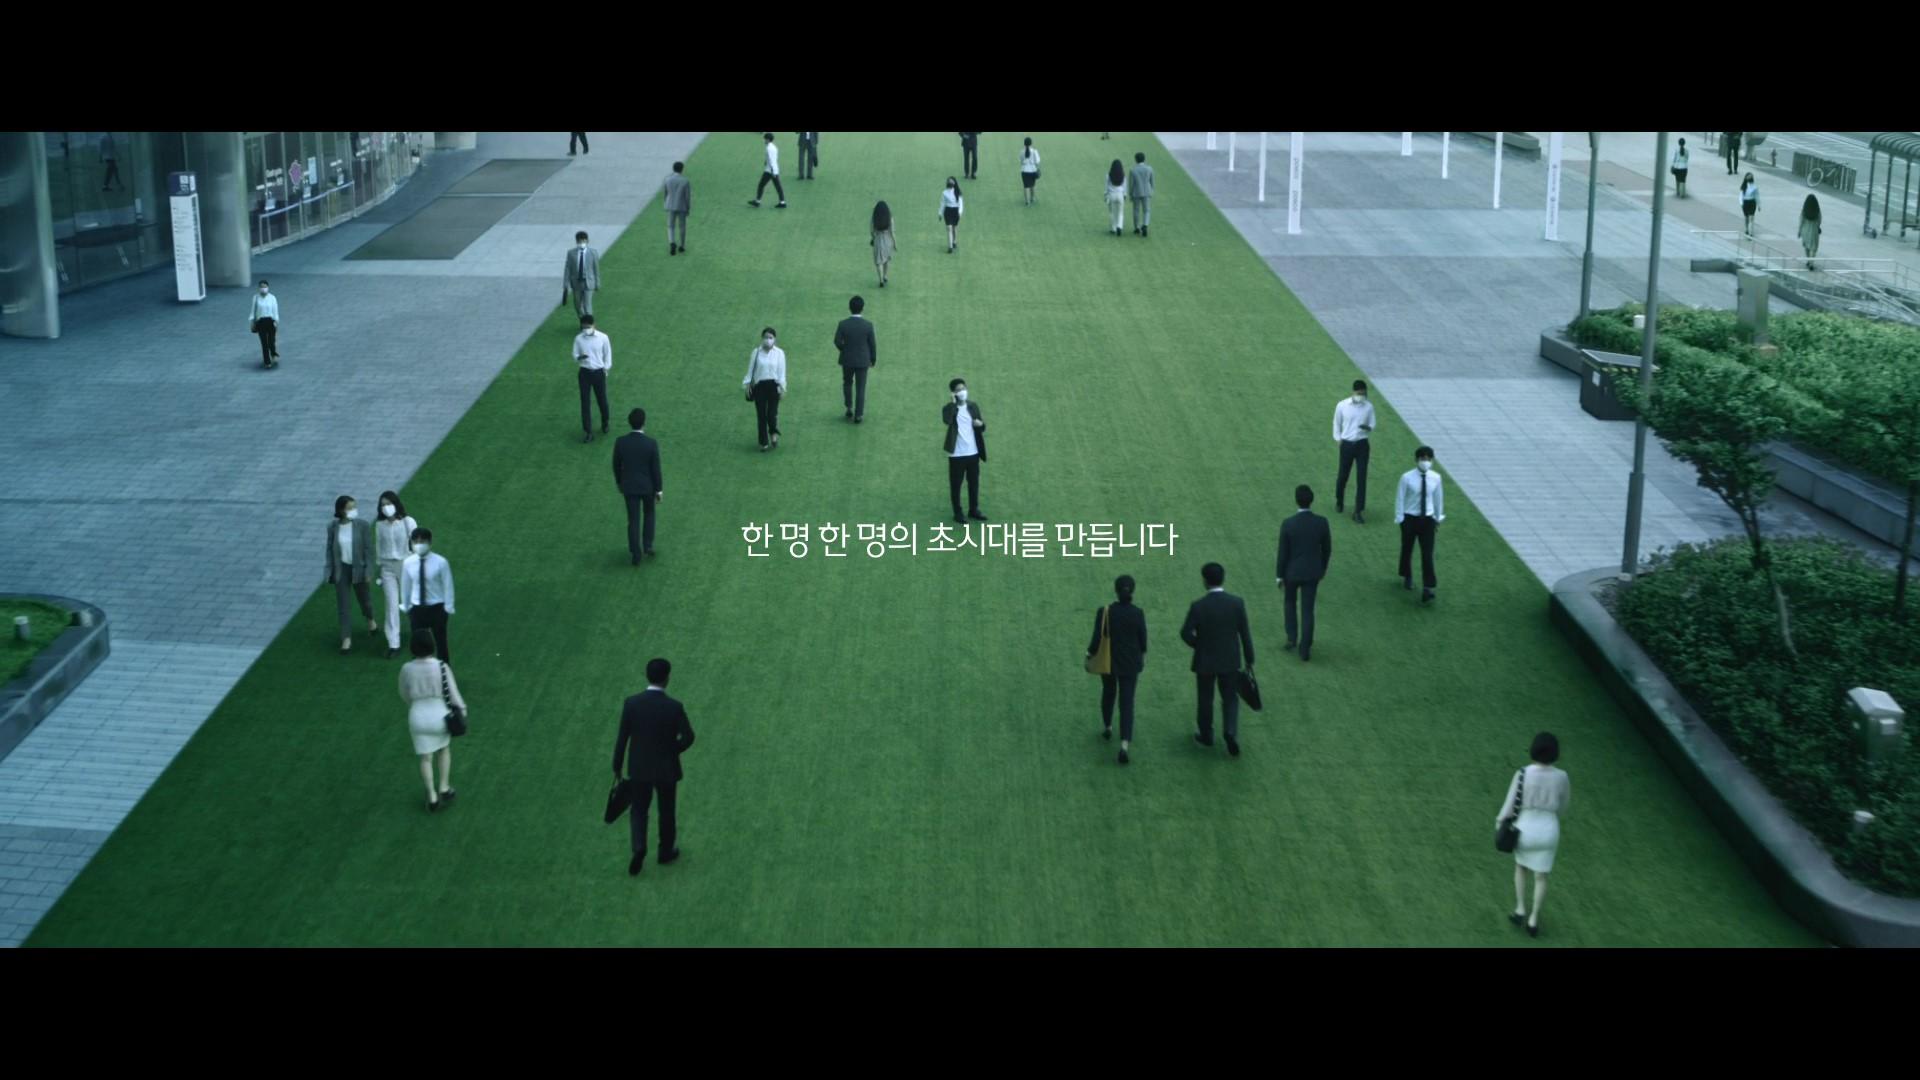 SK텔레콤 광고